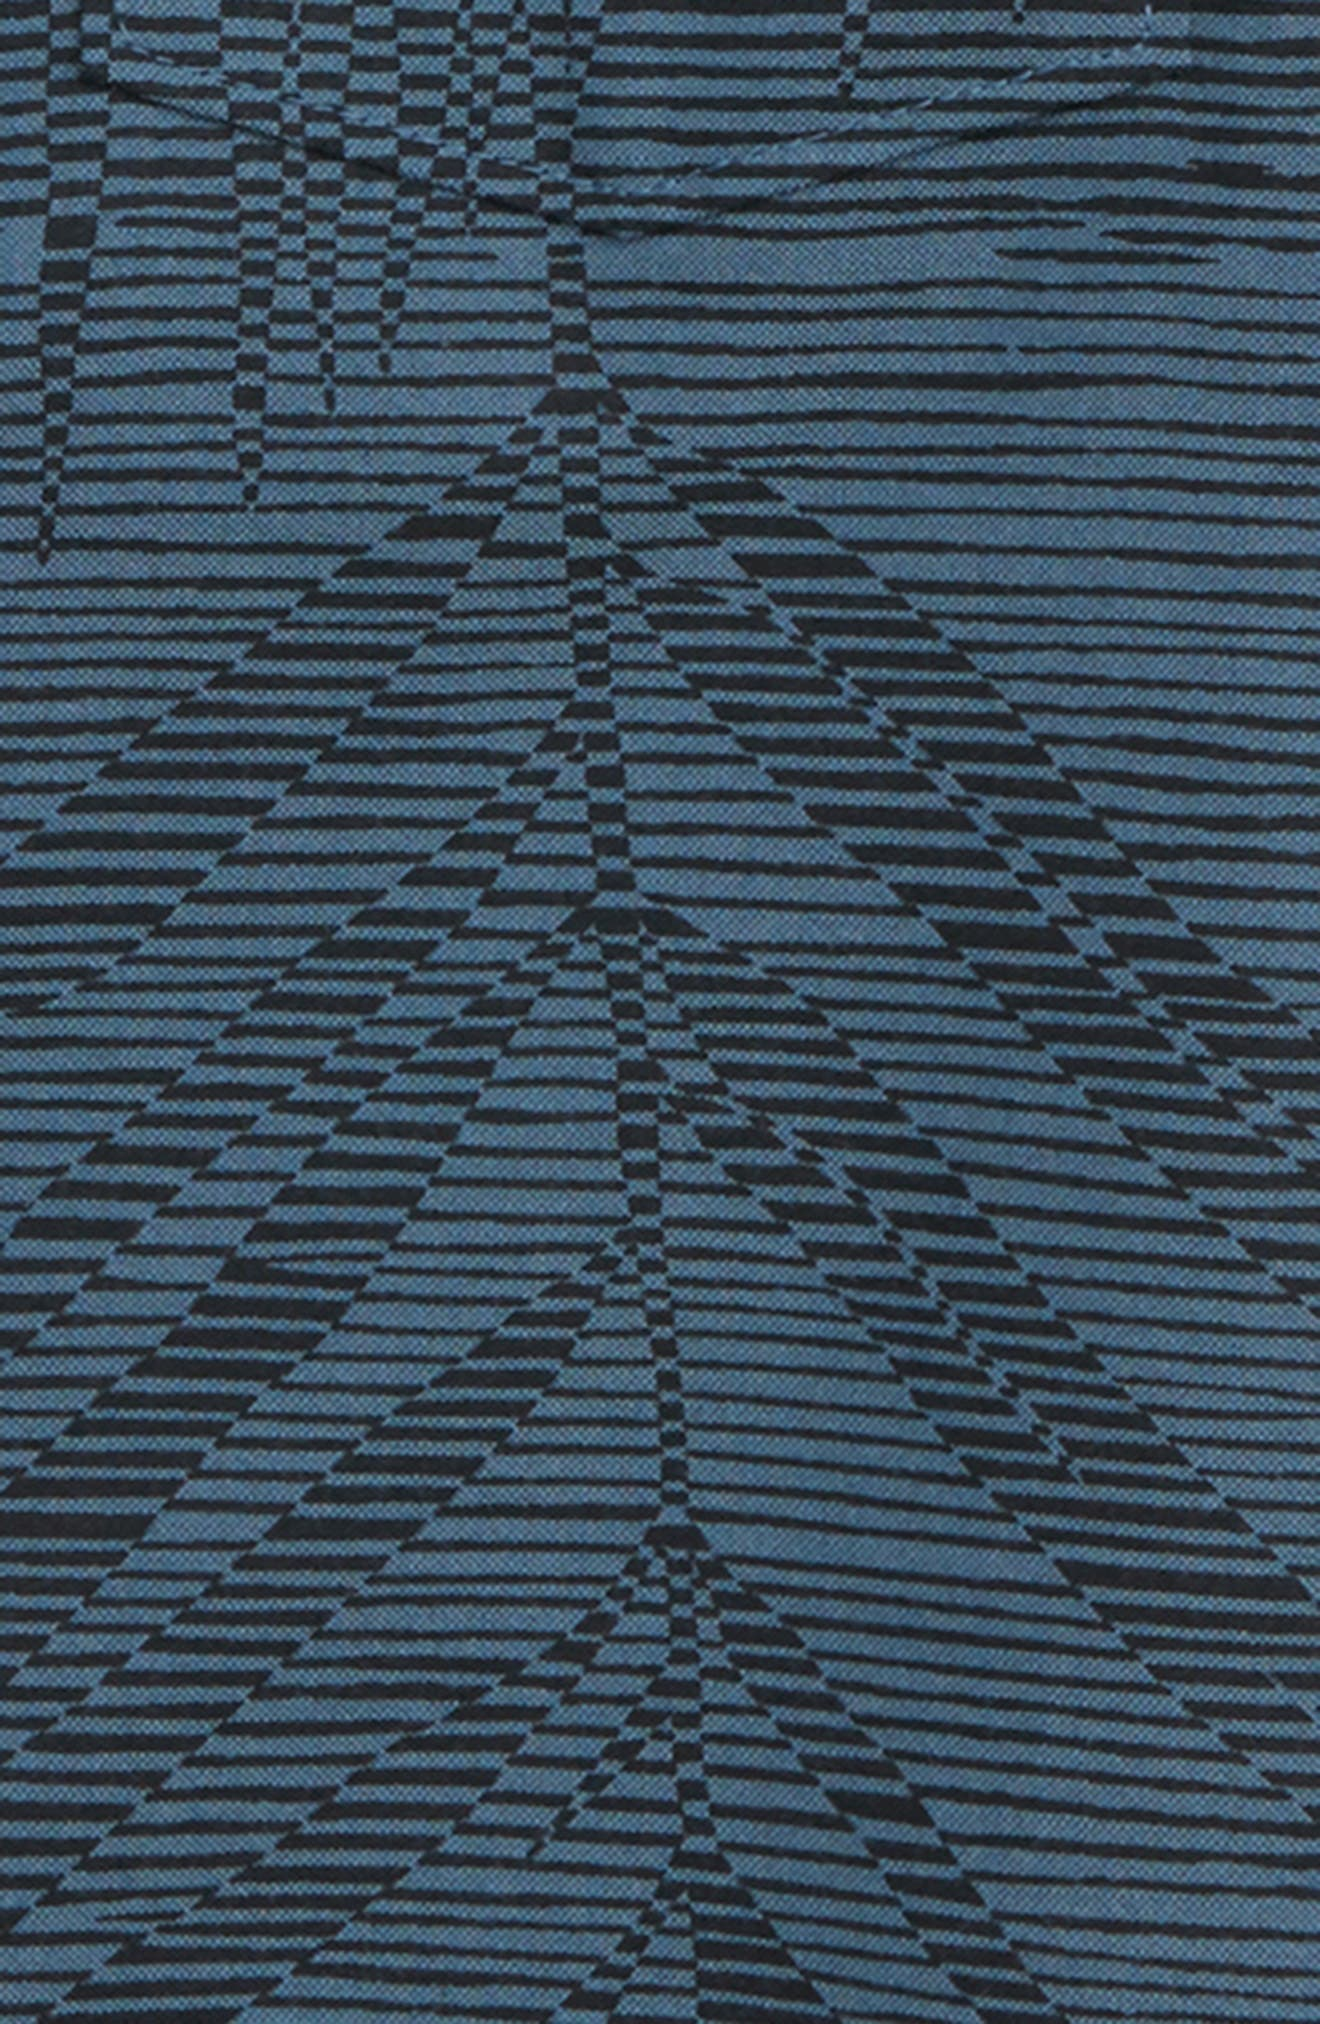 Fronzarelli Woven Shirt,                             Alternate thumbnail 2, color,                             404